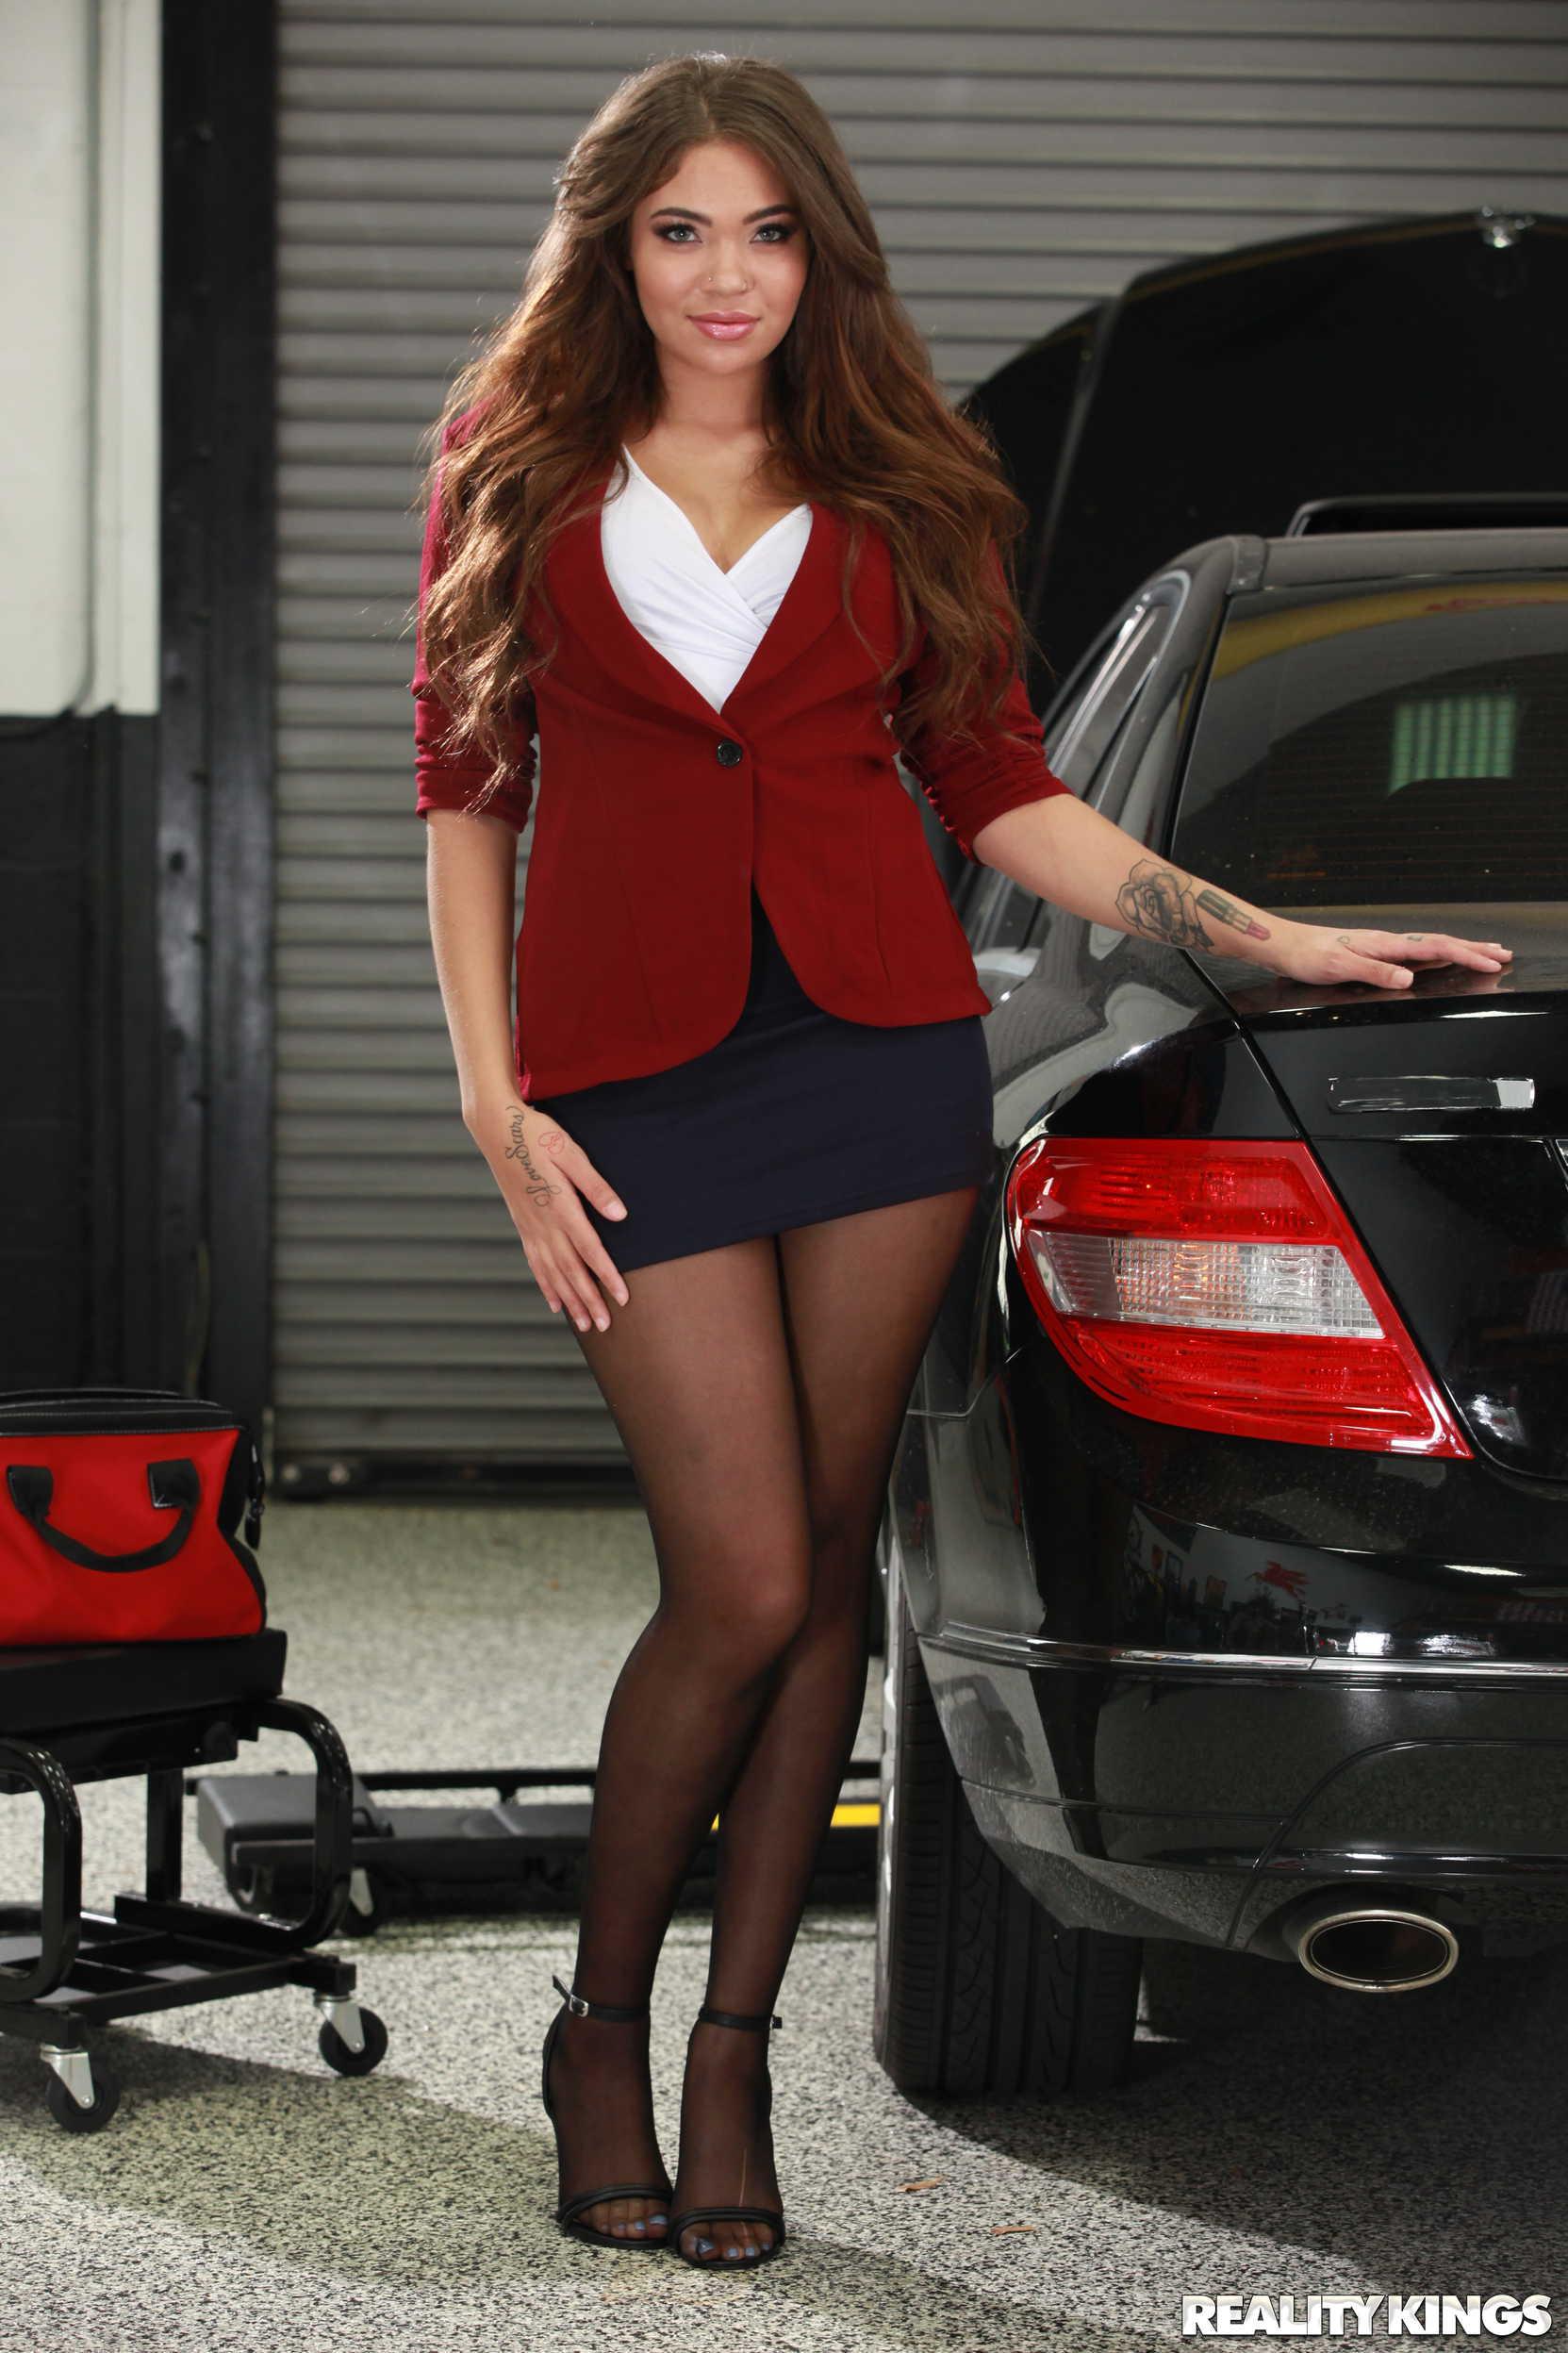 Reality Kings 'My Mechanic Fucked My Wife' starring Cassidy Banks (Photo 1)